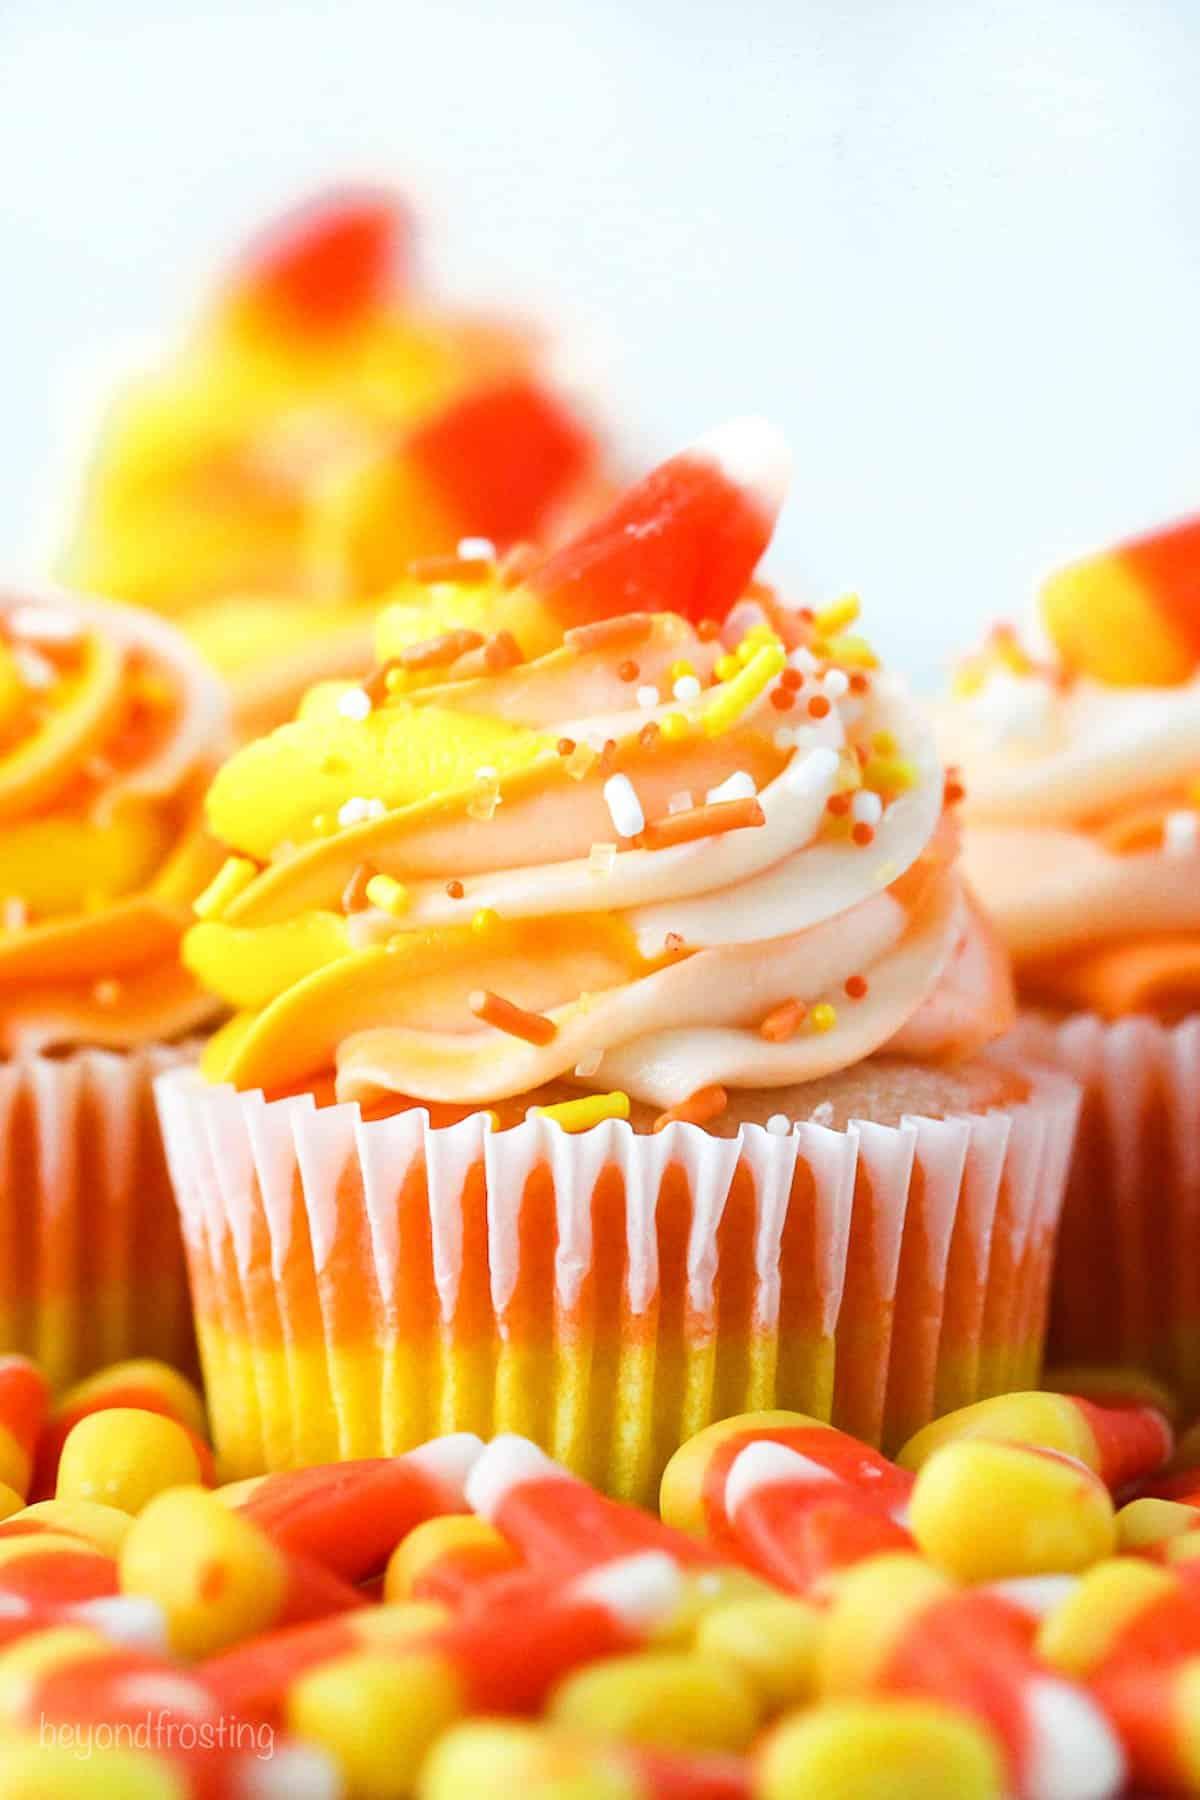 A cupcake decorated like a candy corn